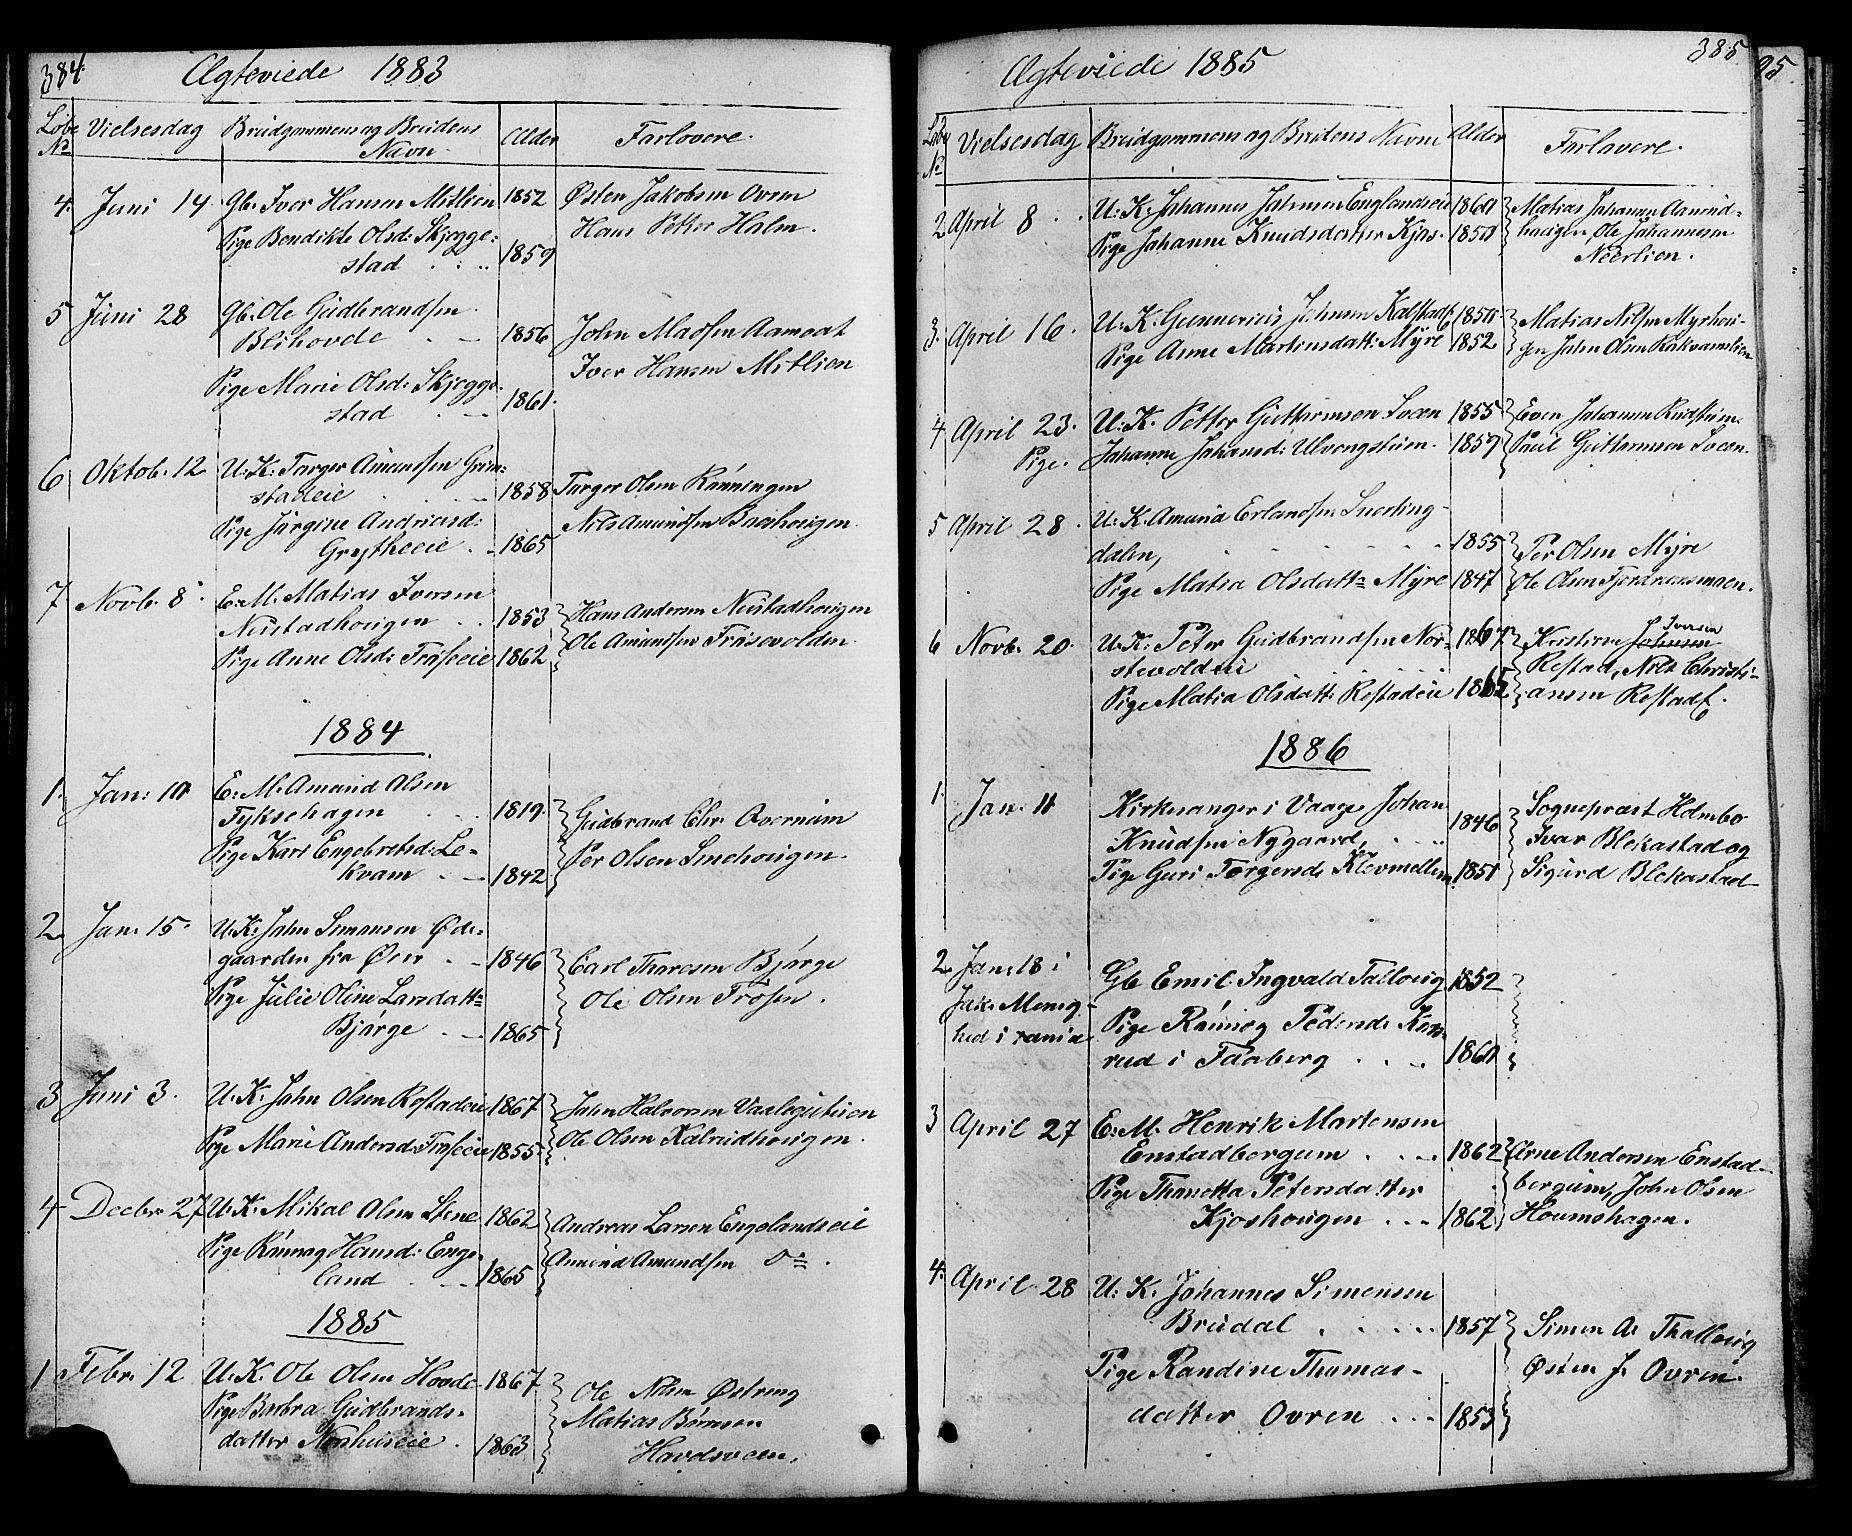 SAH, Østre Gausdal prestekontor, Klokkerbok nr. 1, 1863-1893, s. 384-385